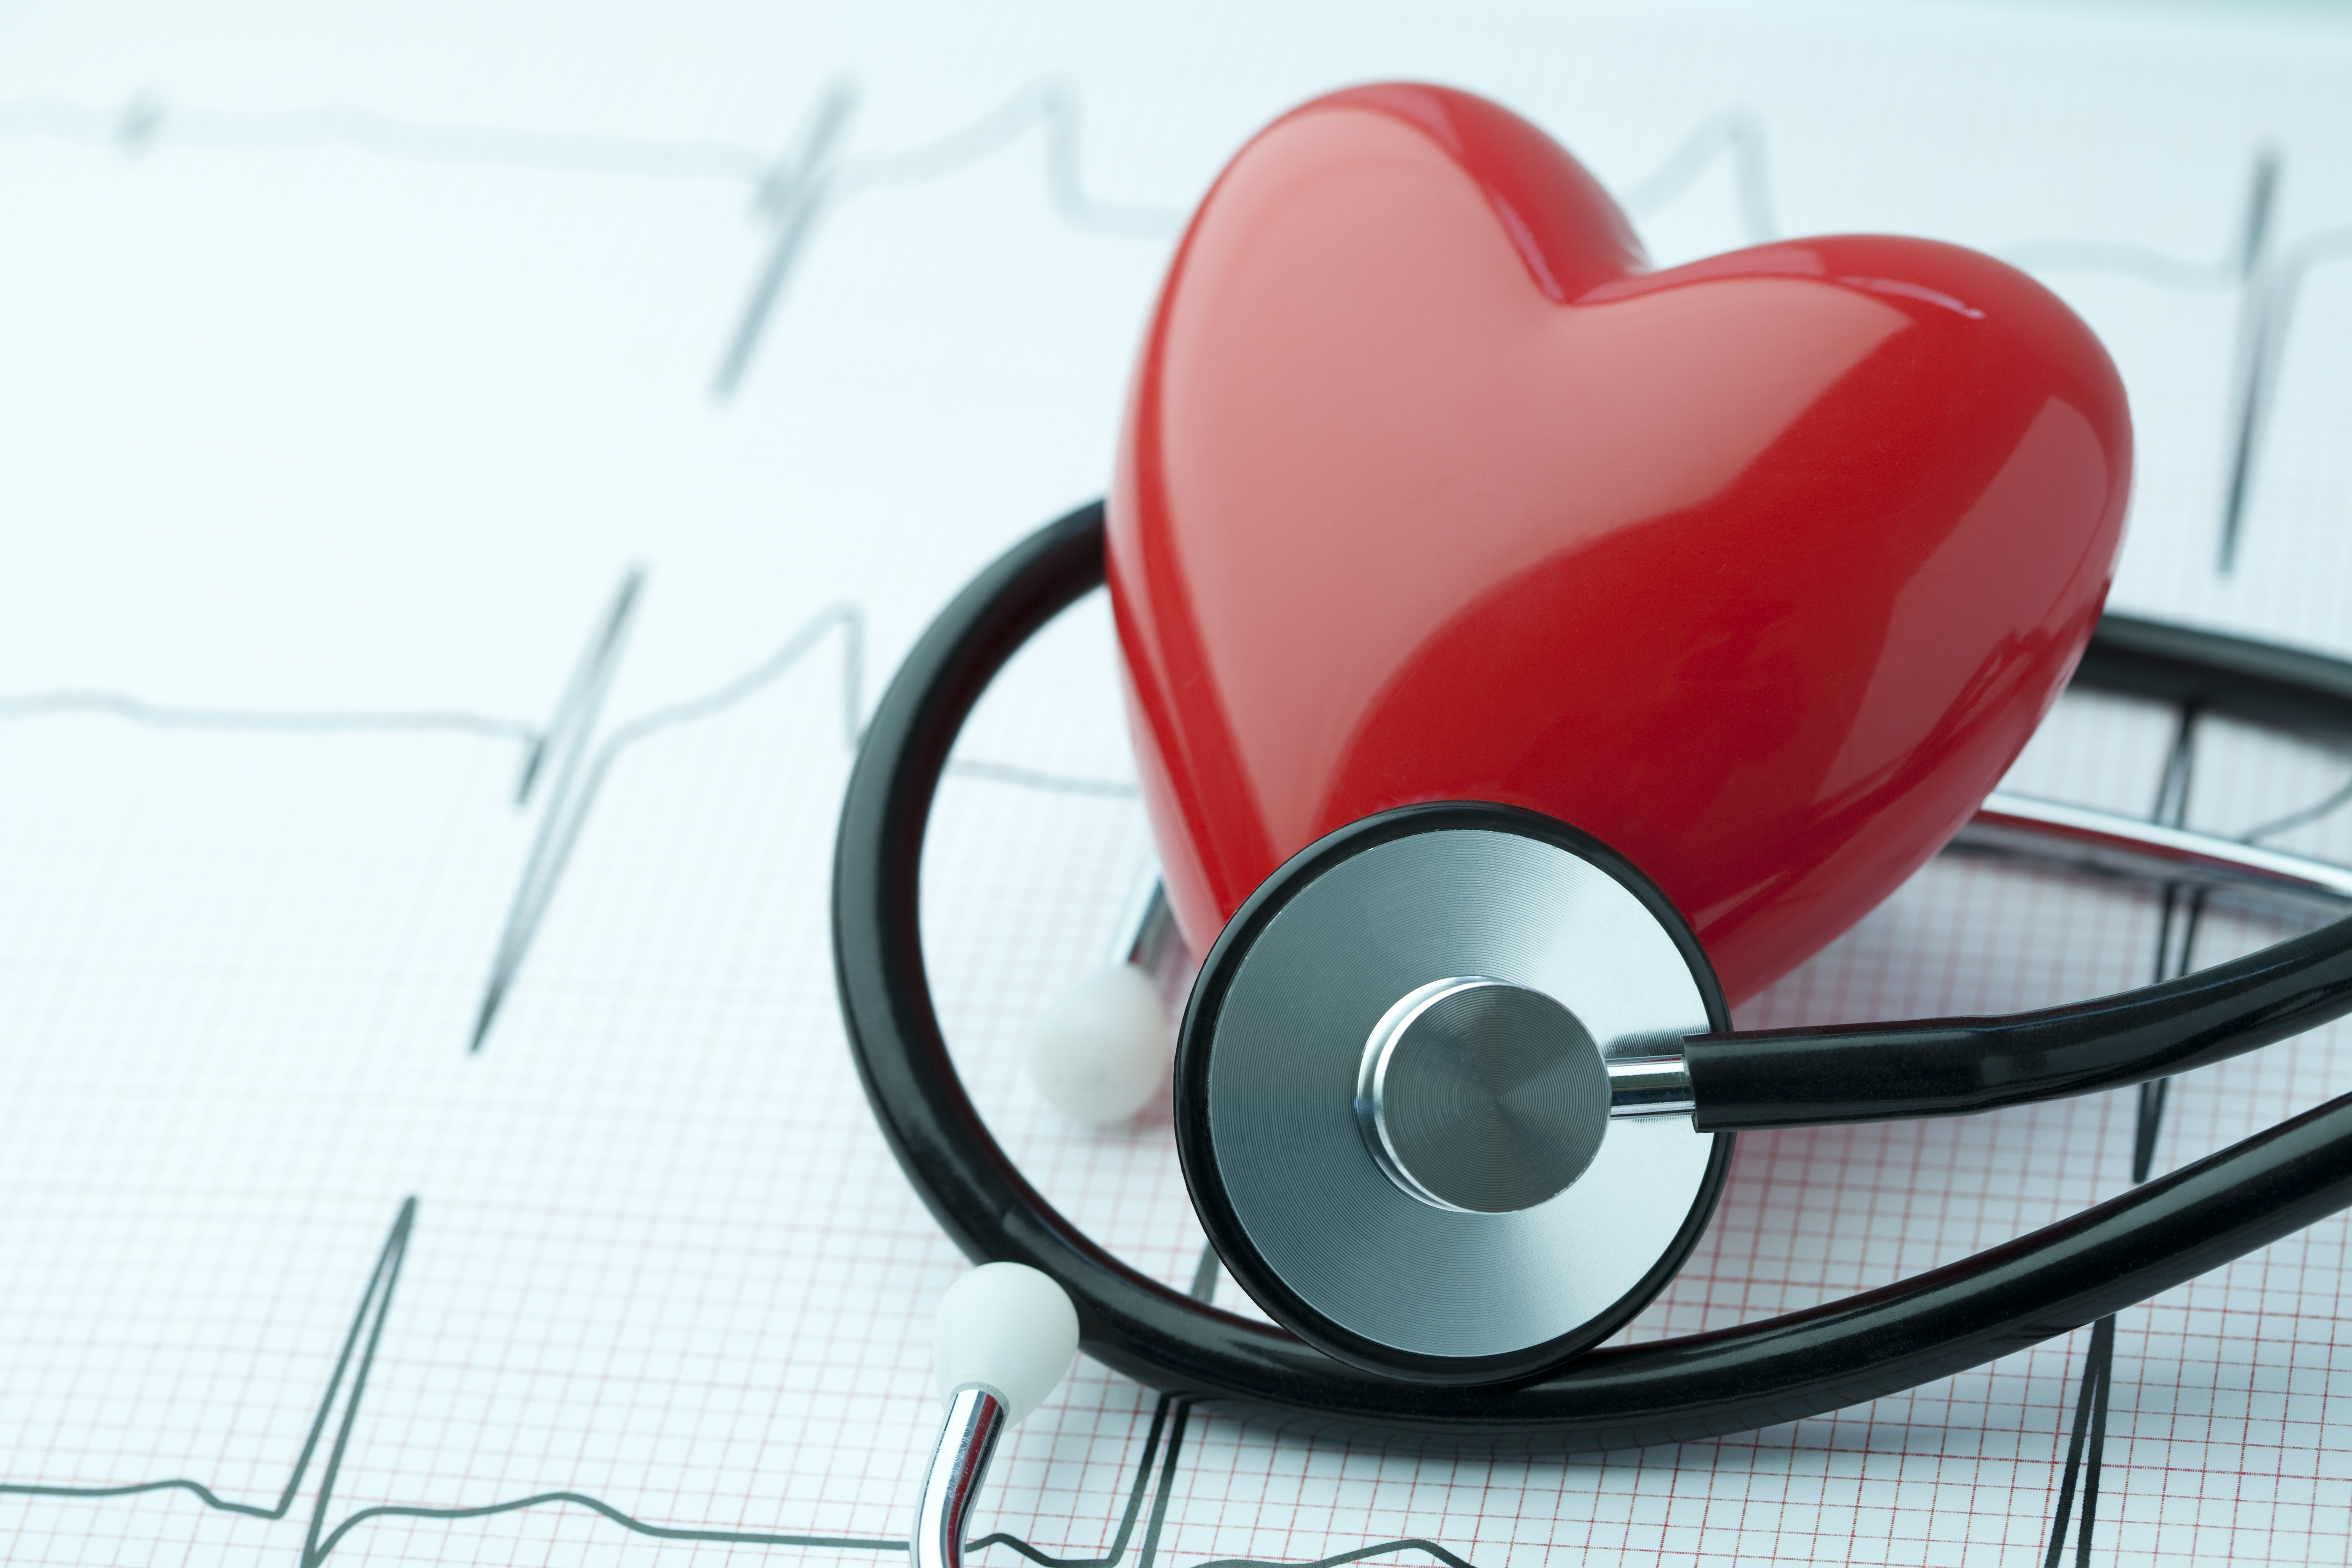 EKG ECG electrocardiogram